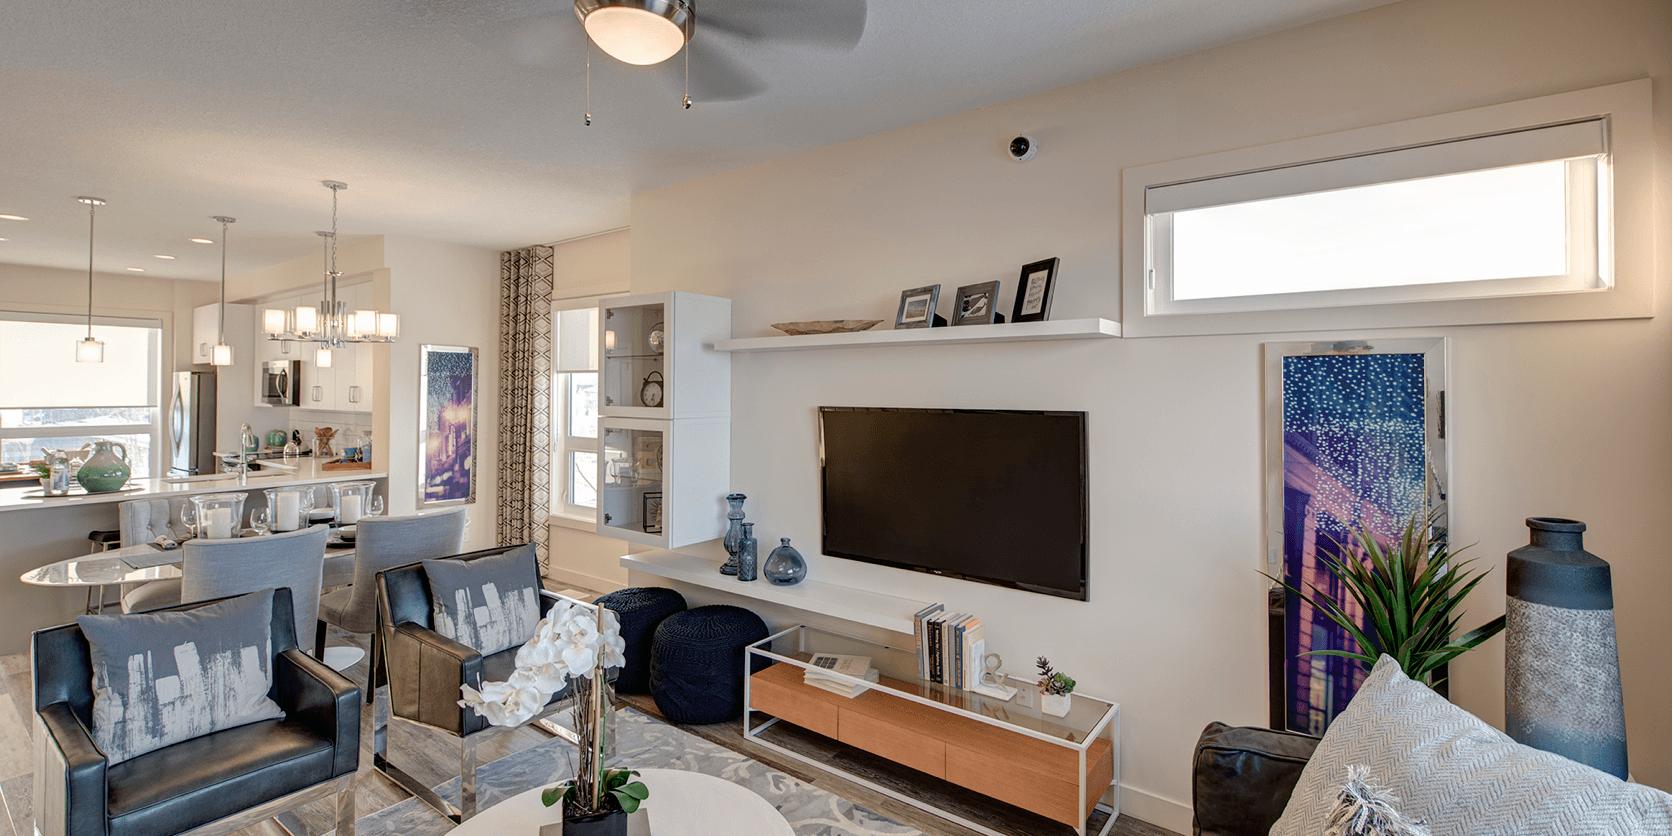 Multi-Purpose Furniture Ideas for Your Condo Featured Image